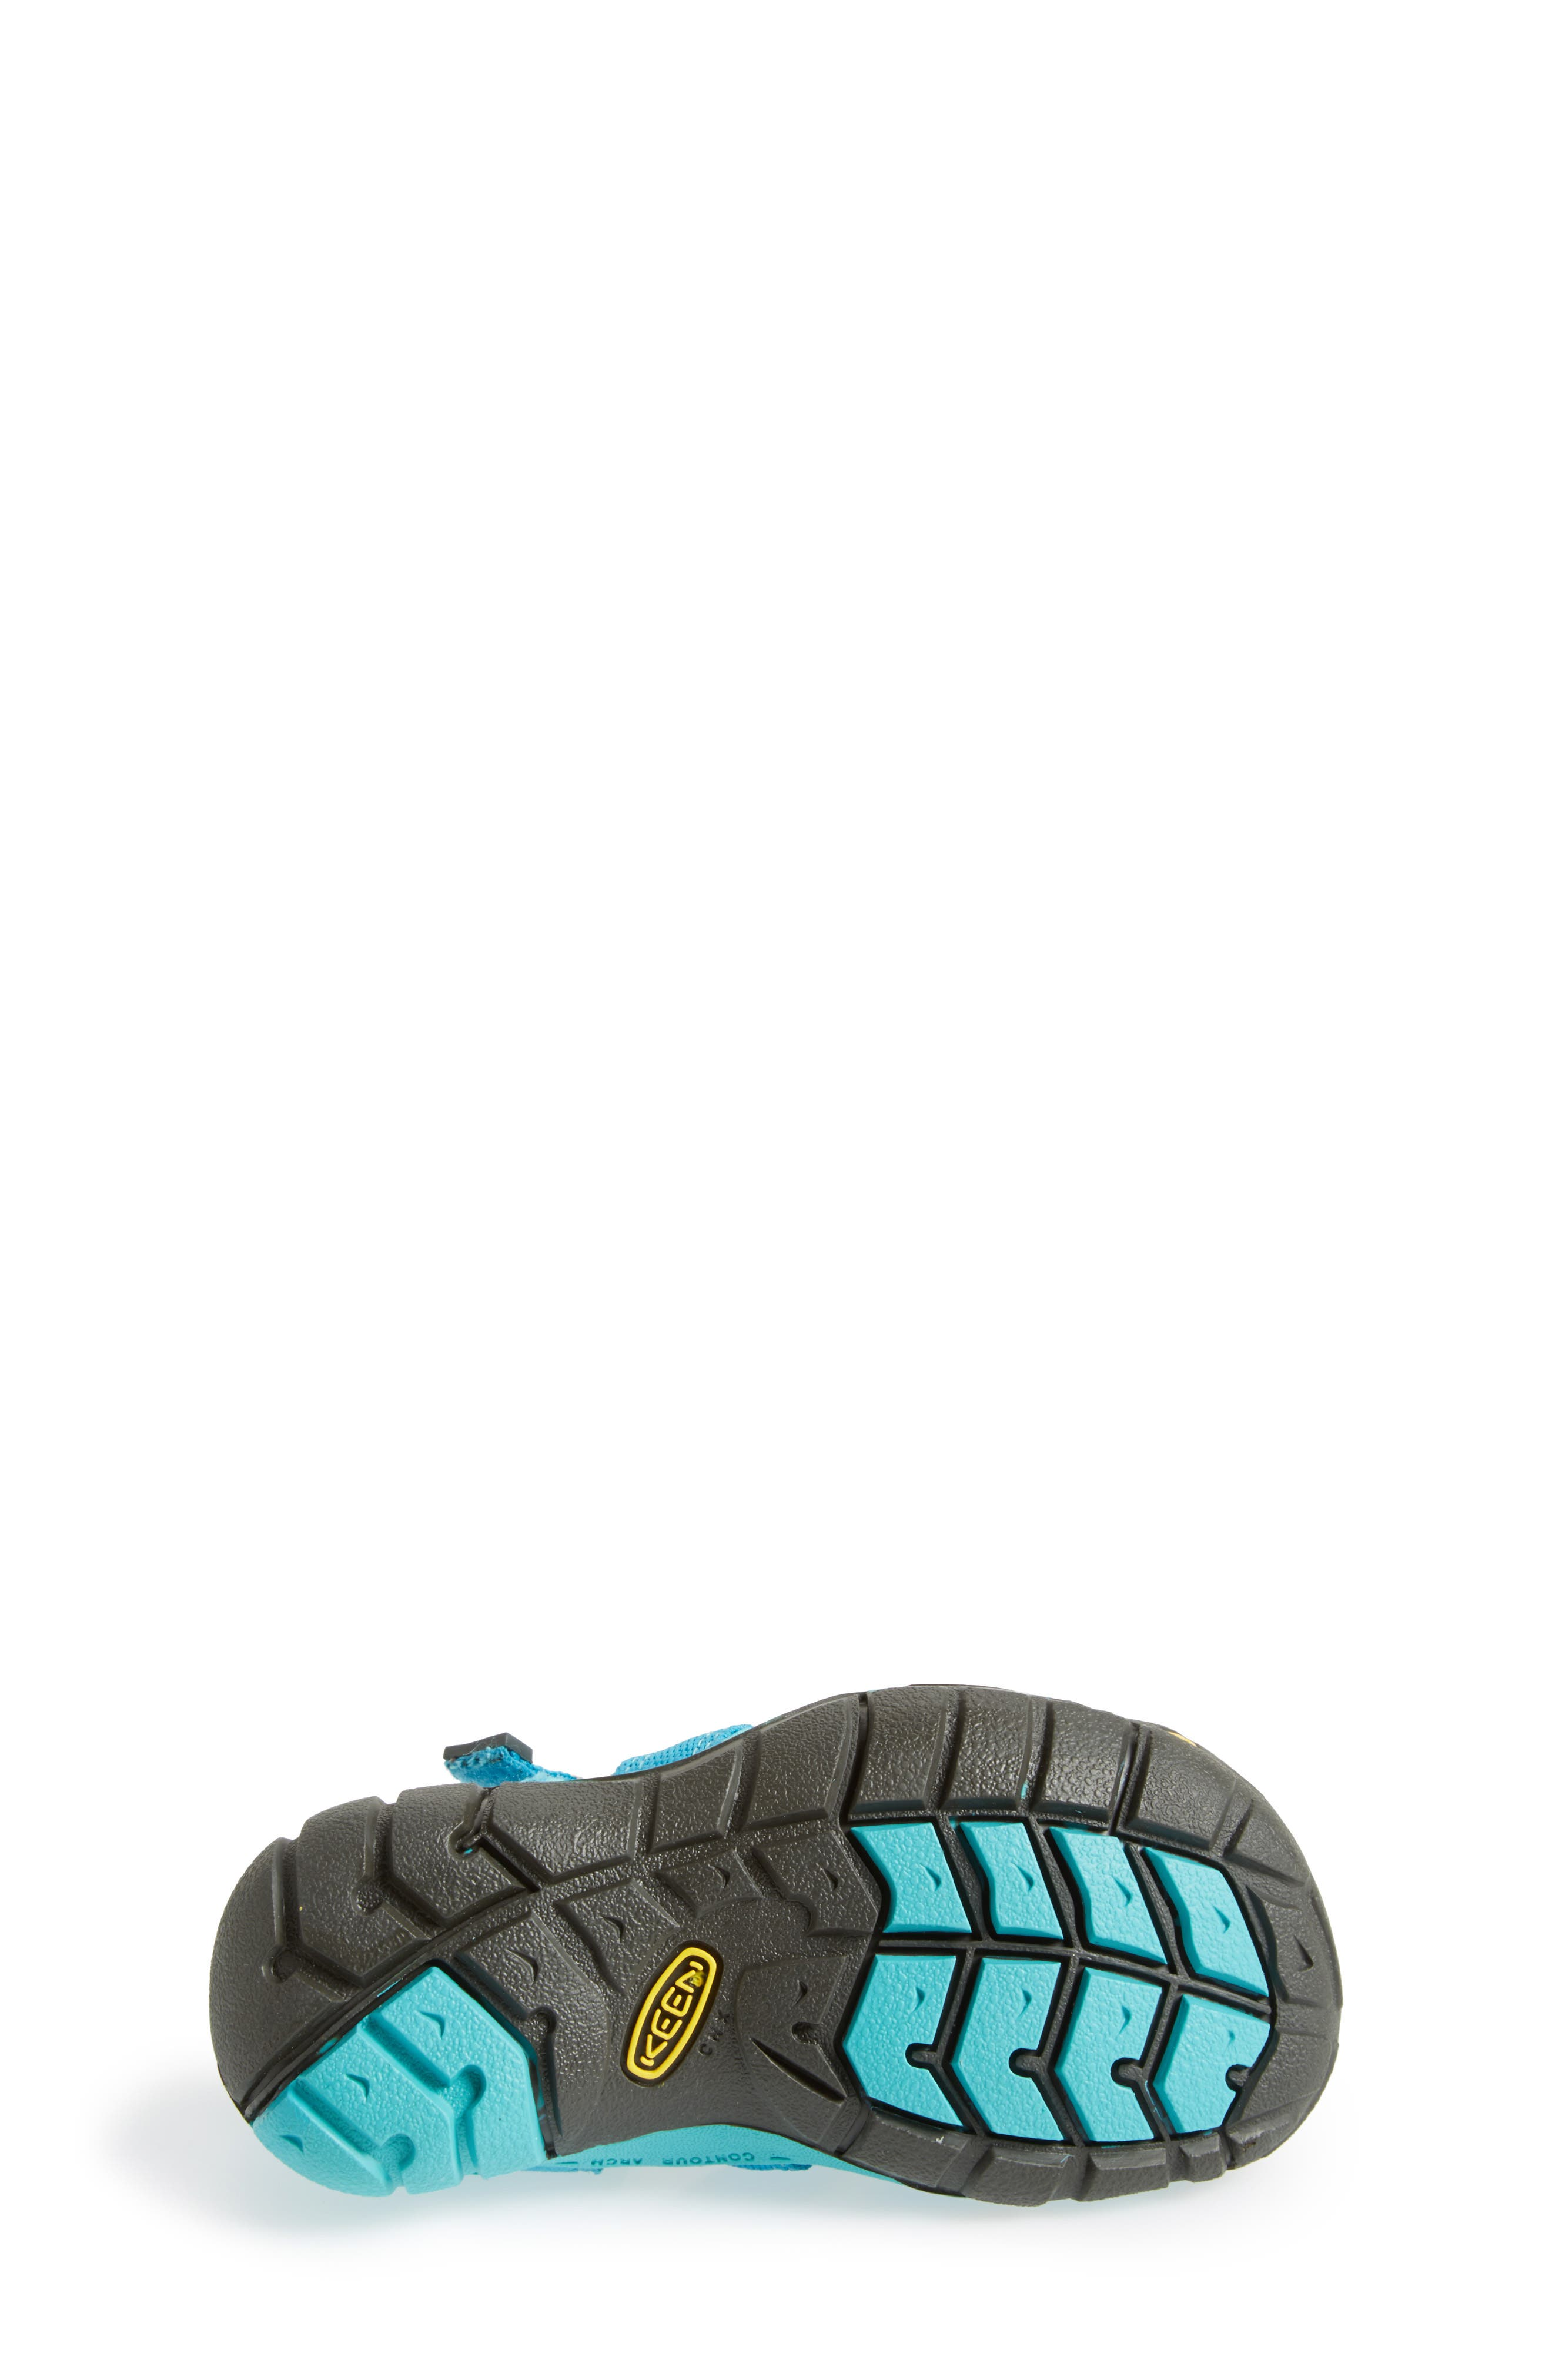 ,                             'Seacamp II' Water Friendly Sandal,                             Alternate thumbnail 200, color,                             440